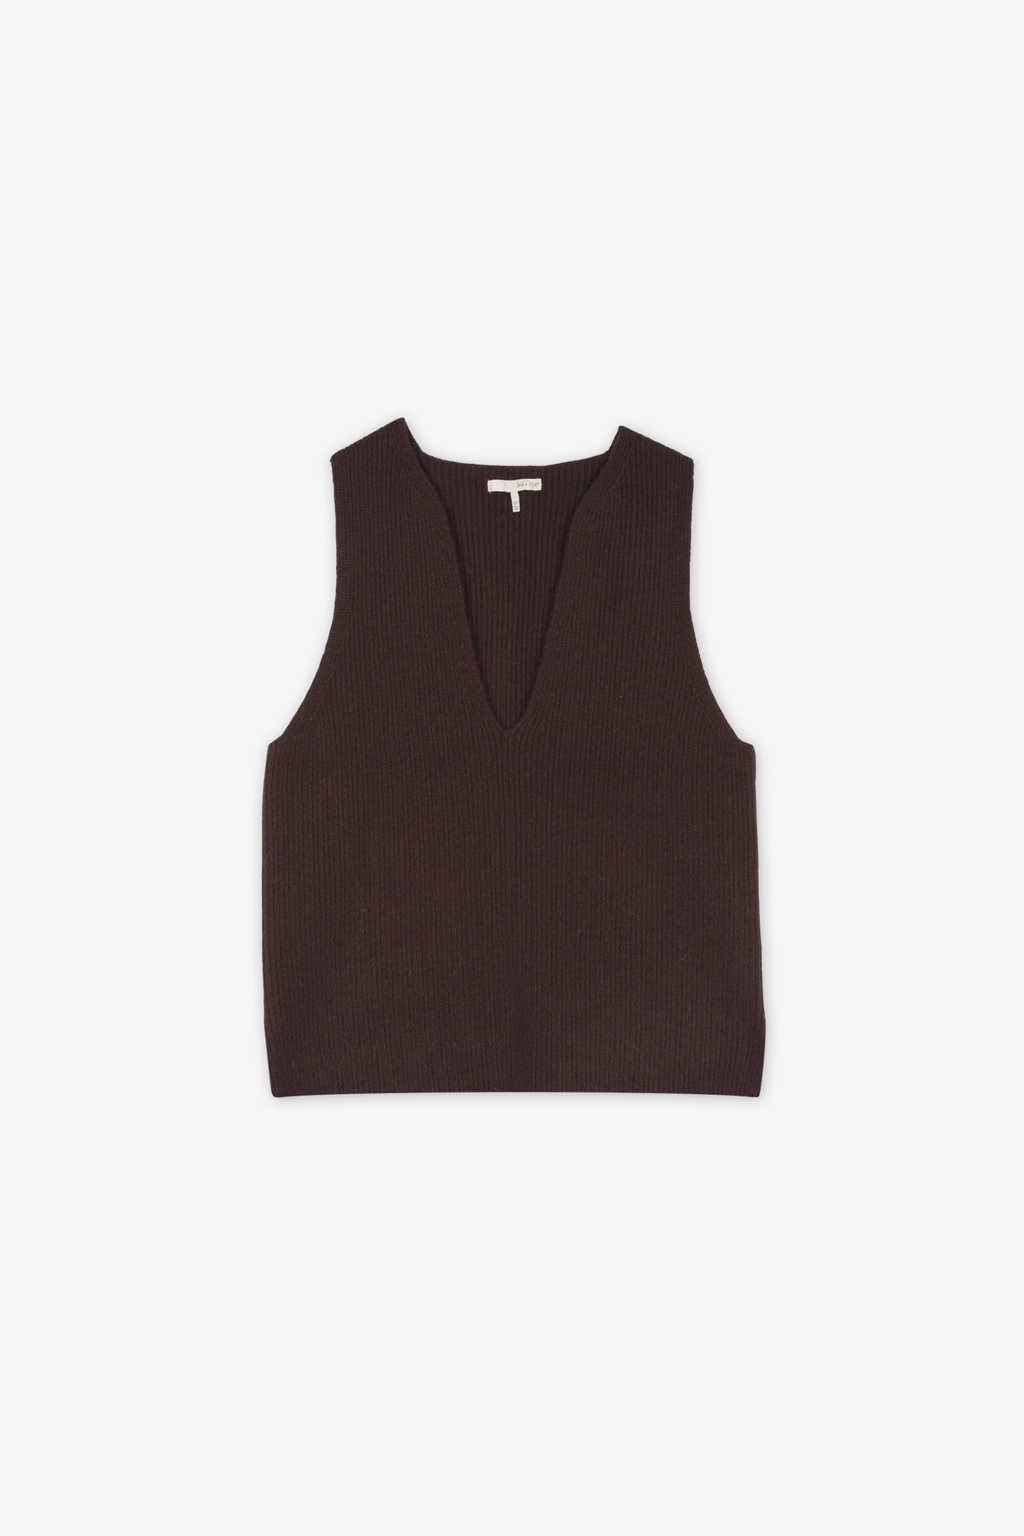 Vest G26 Brown 5